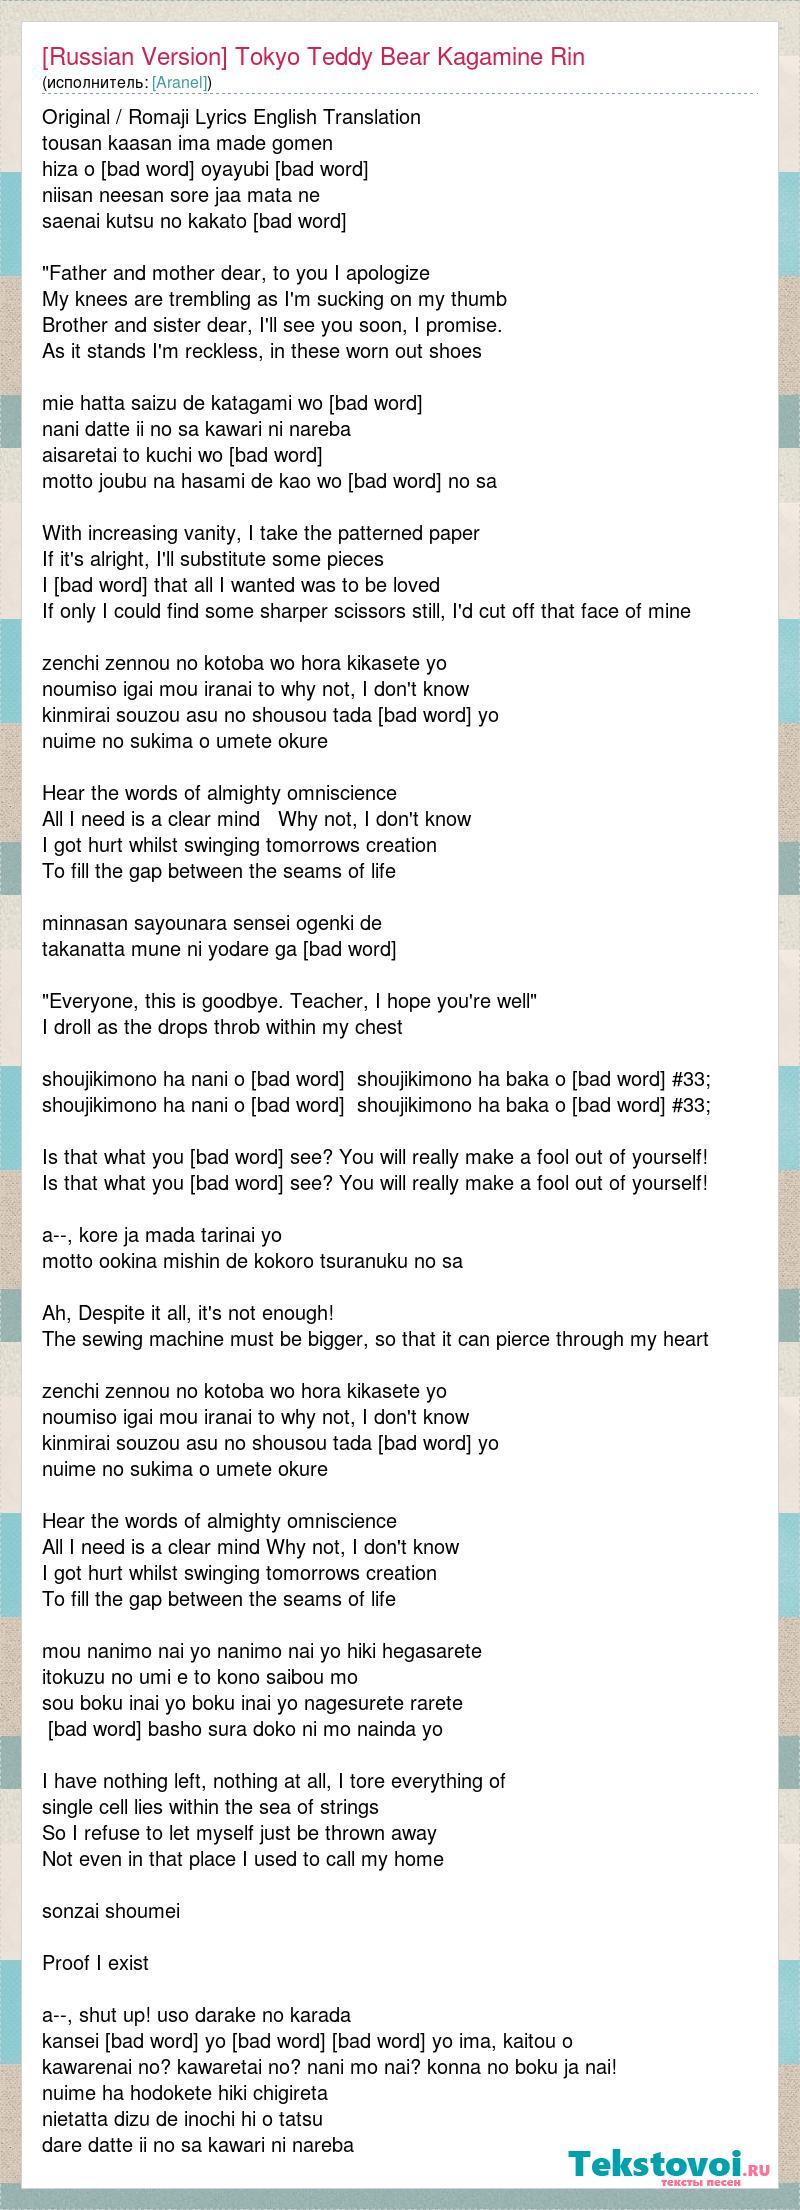 96 Part 8 Russian Swear Words Russian Language Tutorial